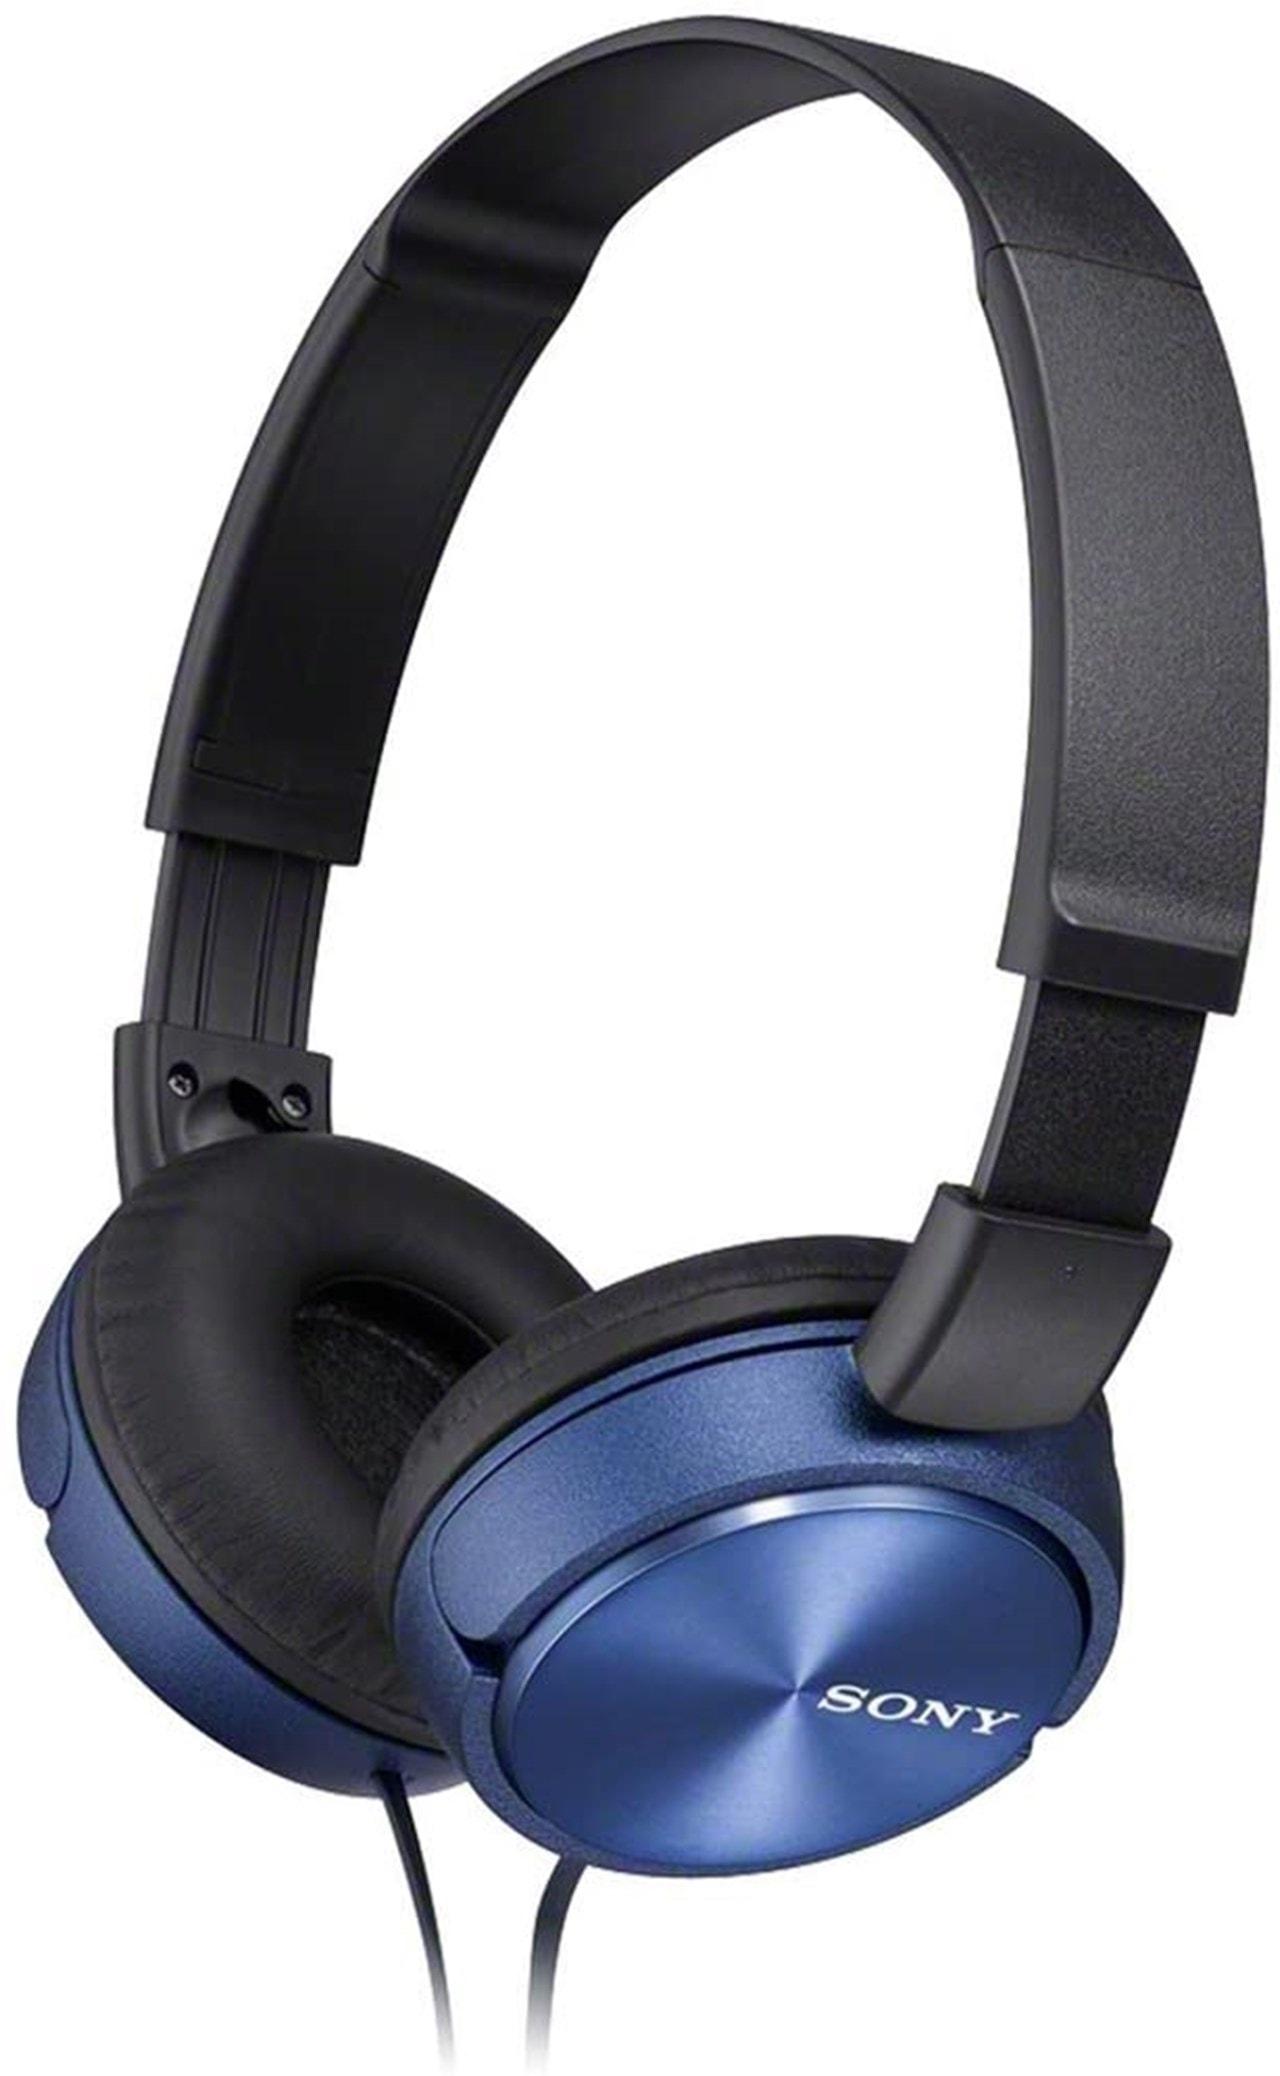 Sony MDRZX310 Blue Headphones - 1